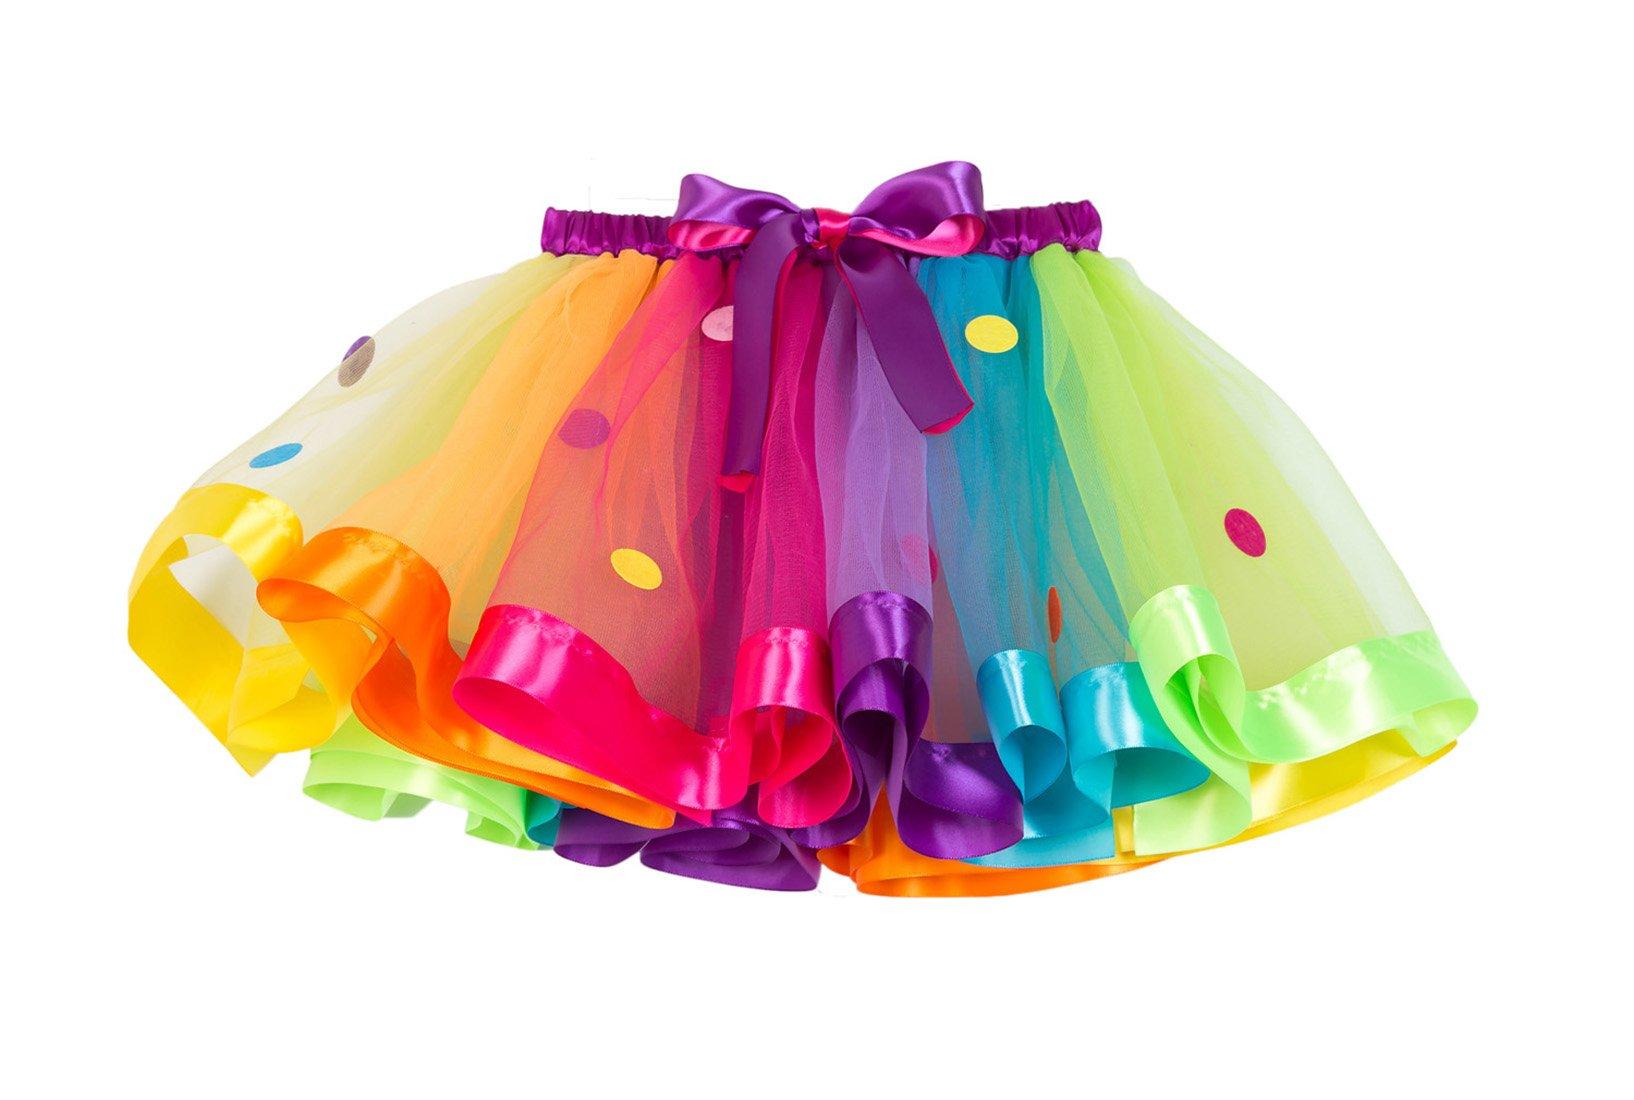 New Little Girls Colorful Rainbow Layered Ribbon Tiered Ballet Tutu Skirt (Wafer Rainbow,Medium/4-6 Years)